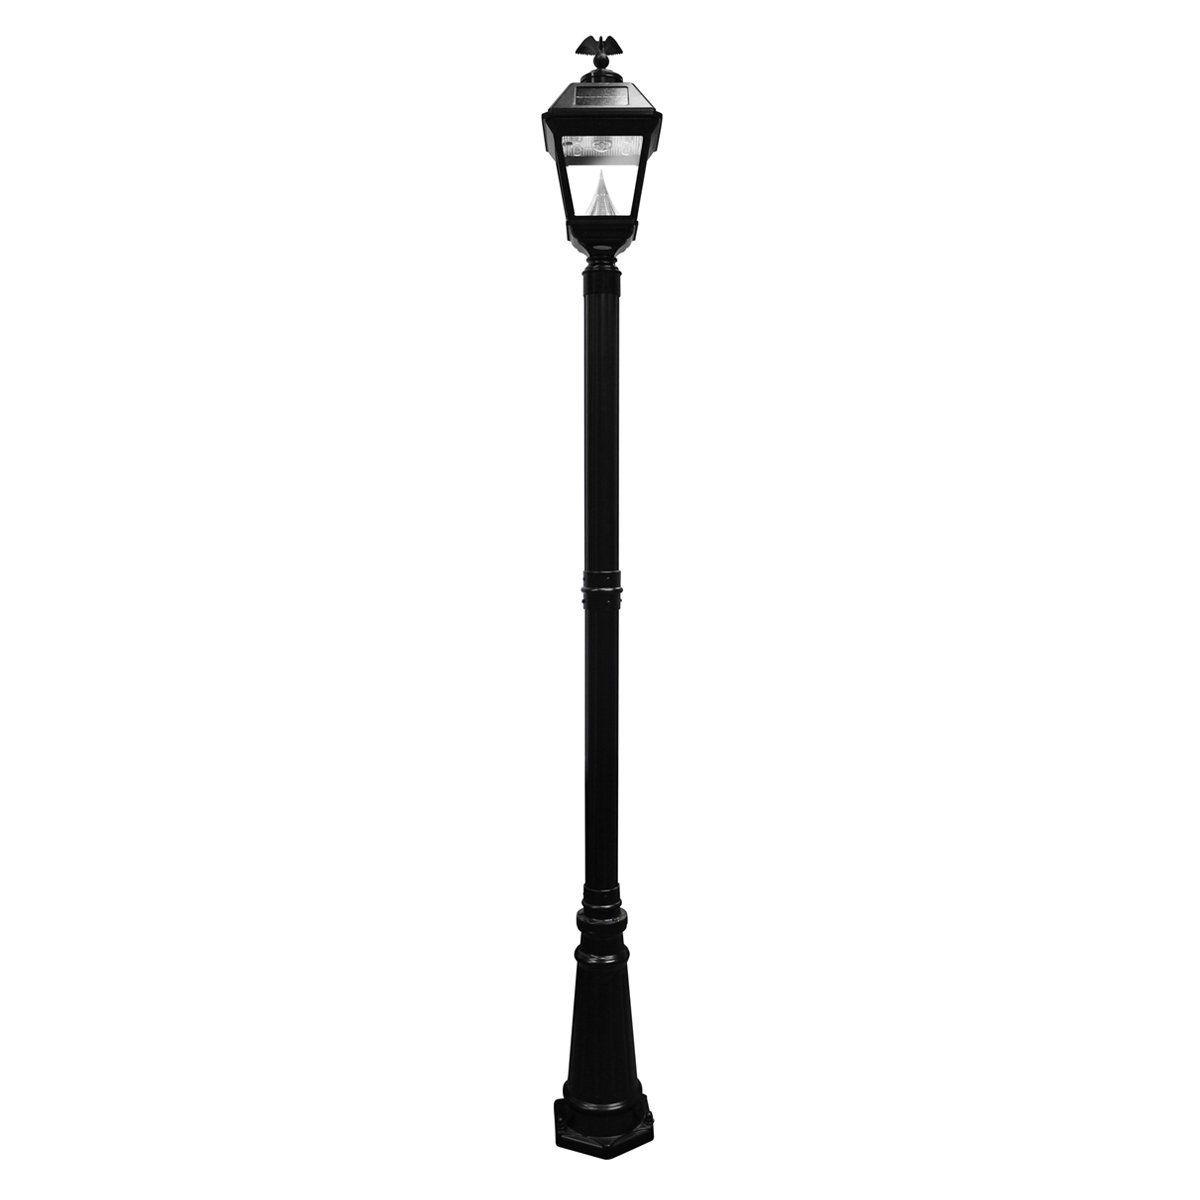 1200x1200 Lamp Post Drawing Insured